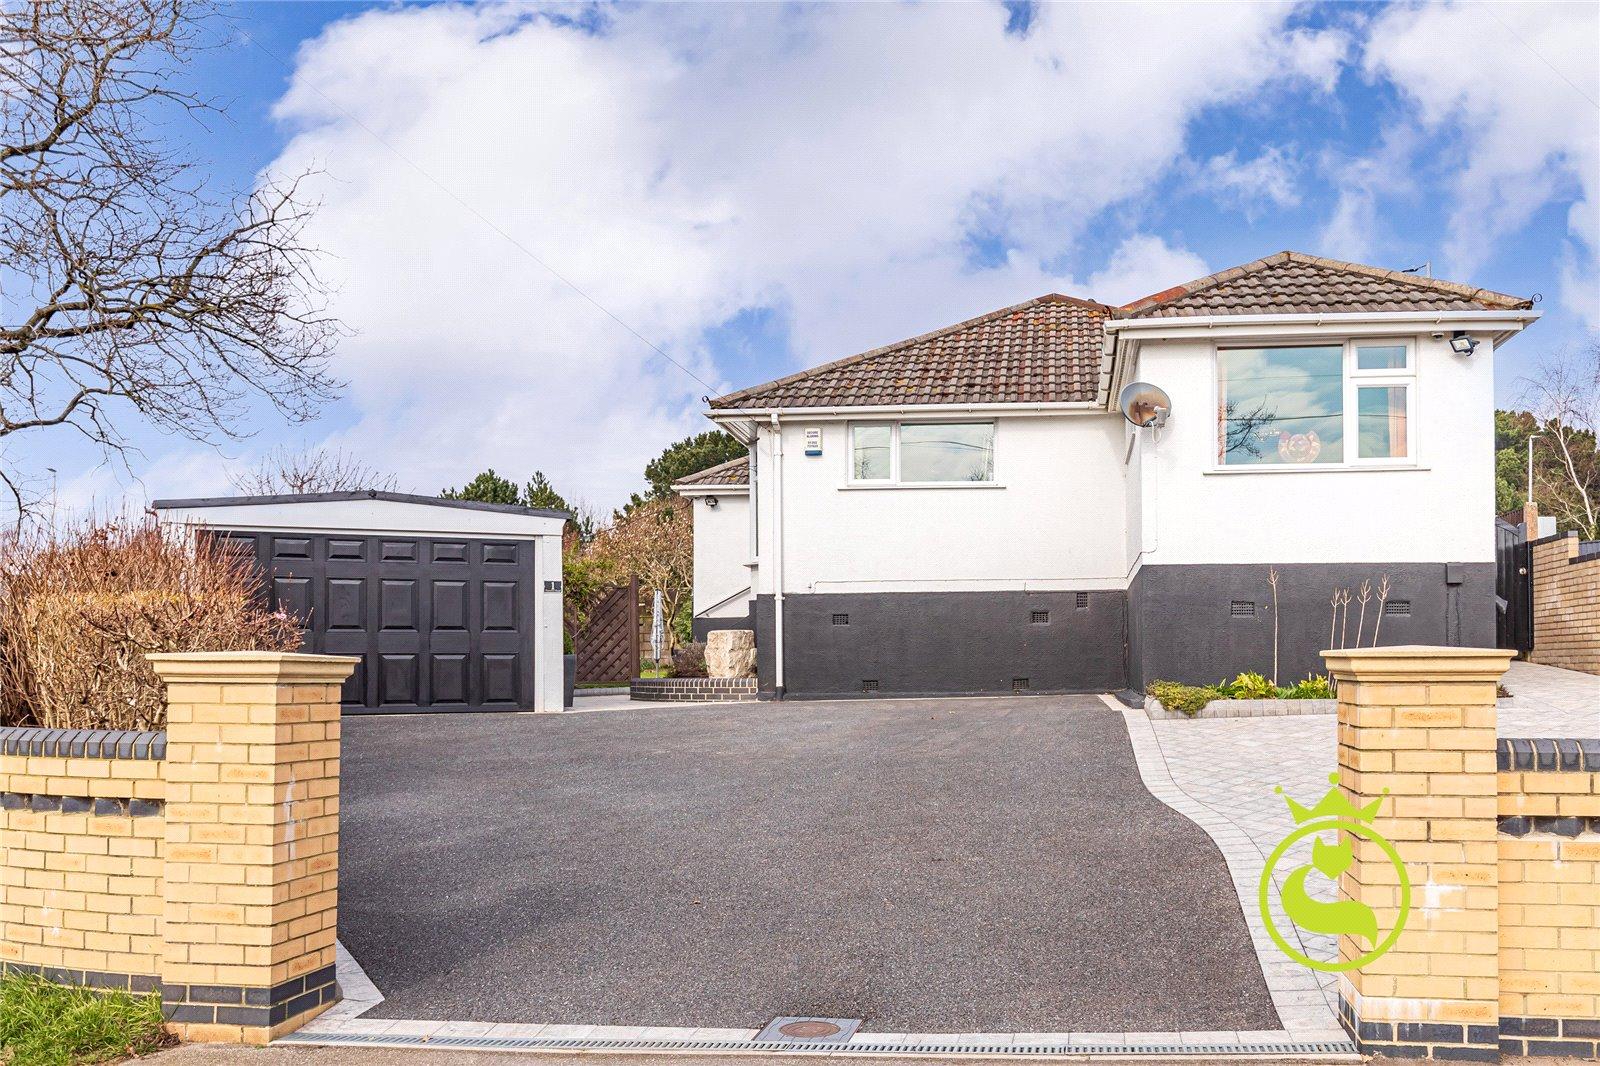 3 bed bungalow for sale in Haymoor Road, Oakdale  - Property Image 1